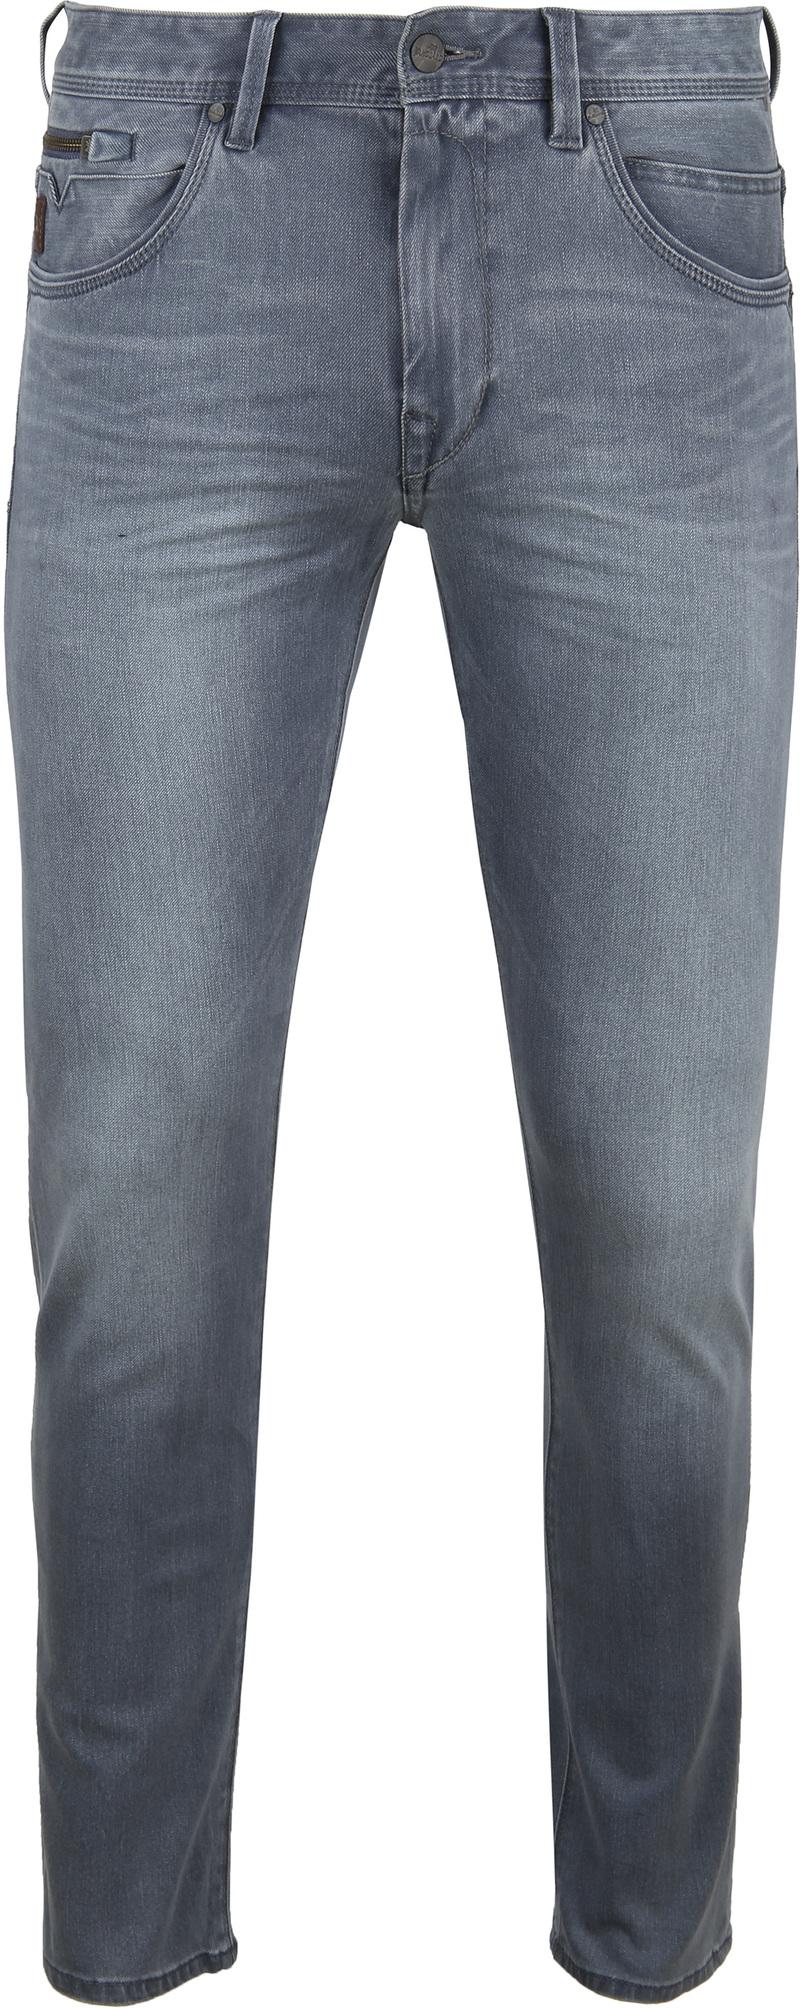 Vanguard V850 Rider Grey Jeans foto 0